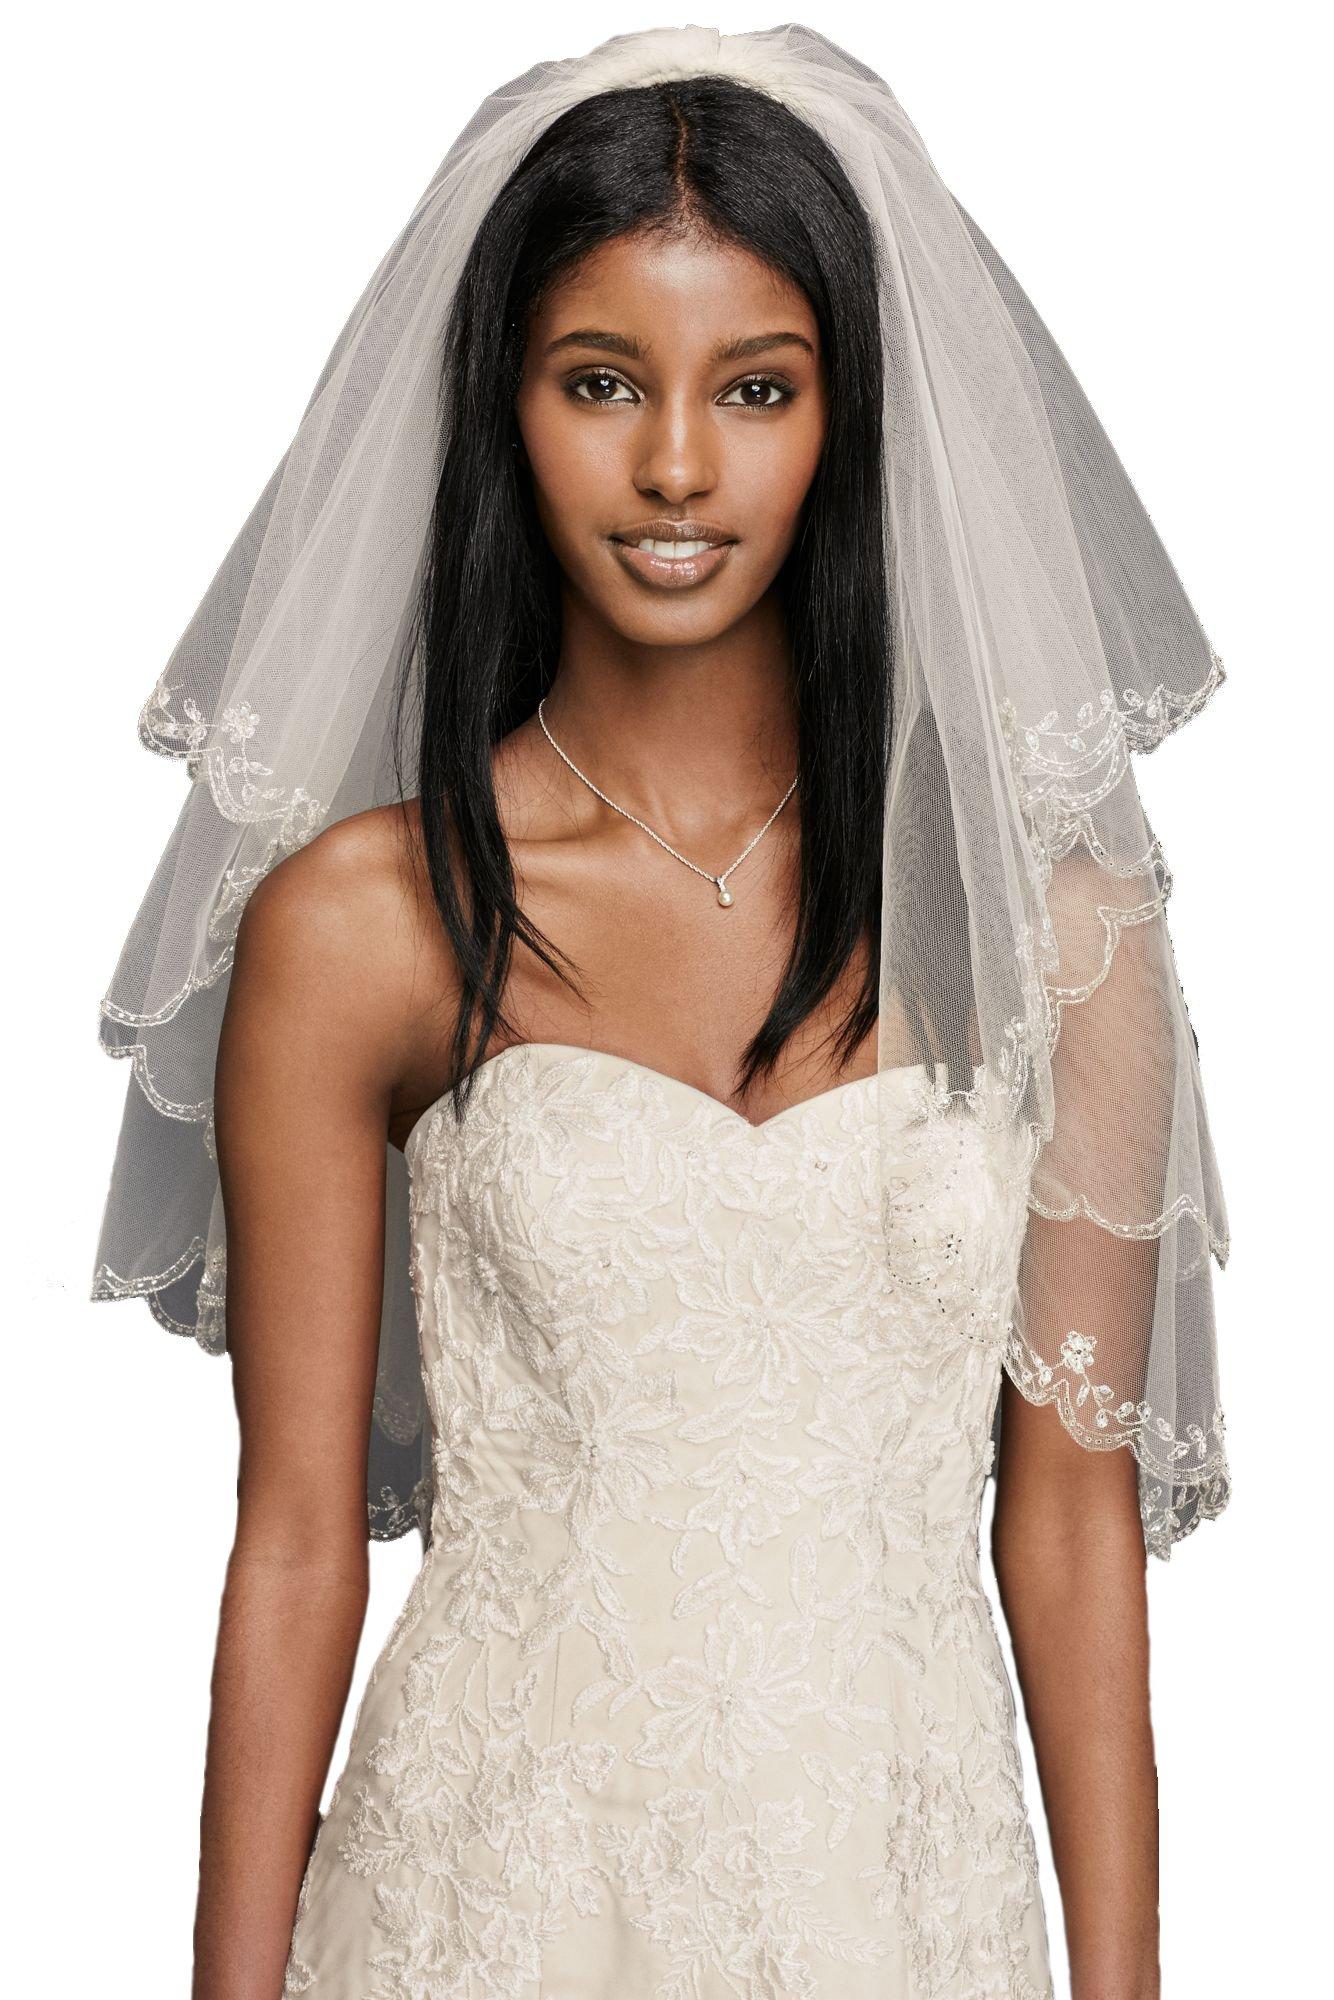 Passat Pale Ivory 2 Tiers 110CM Walking Veil wedding vails beautifully beaded scallop edge Wedding Bridal Veil 137